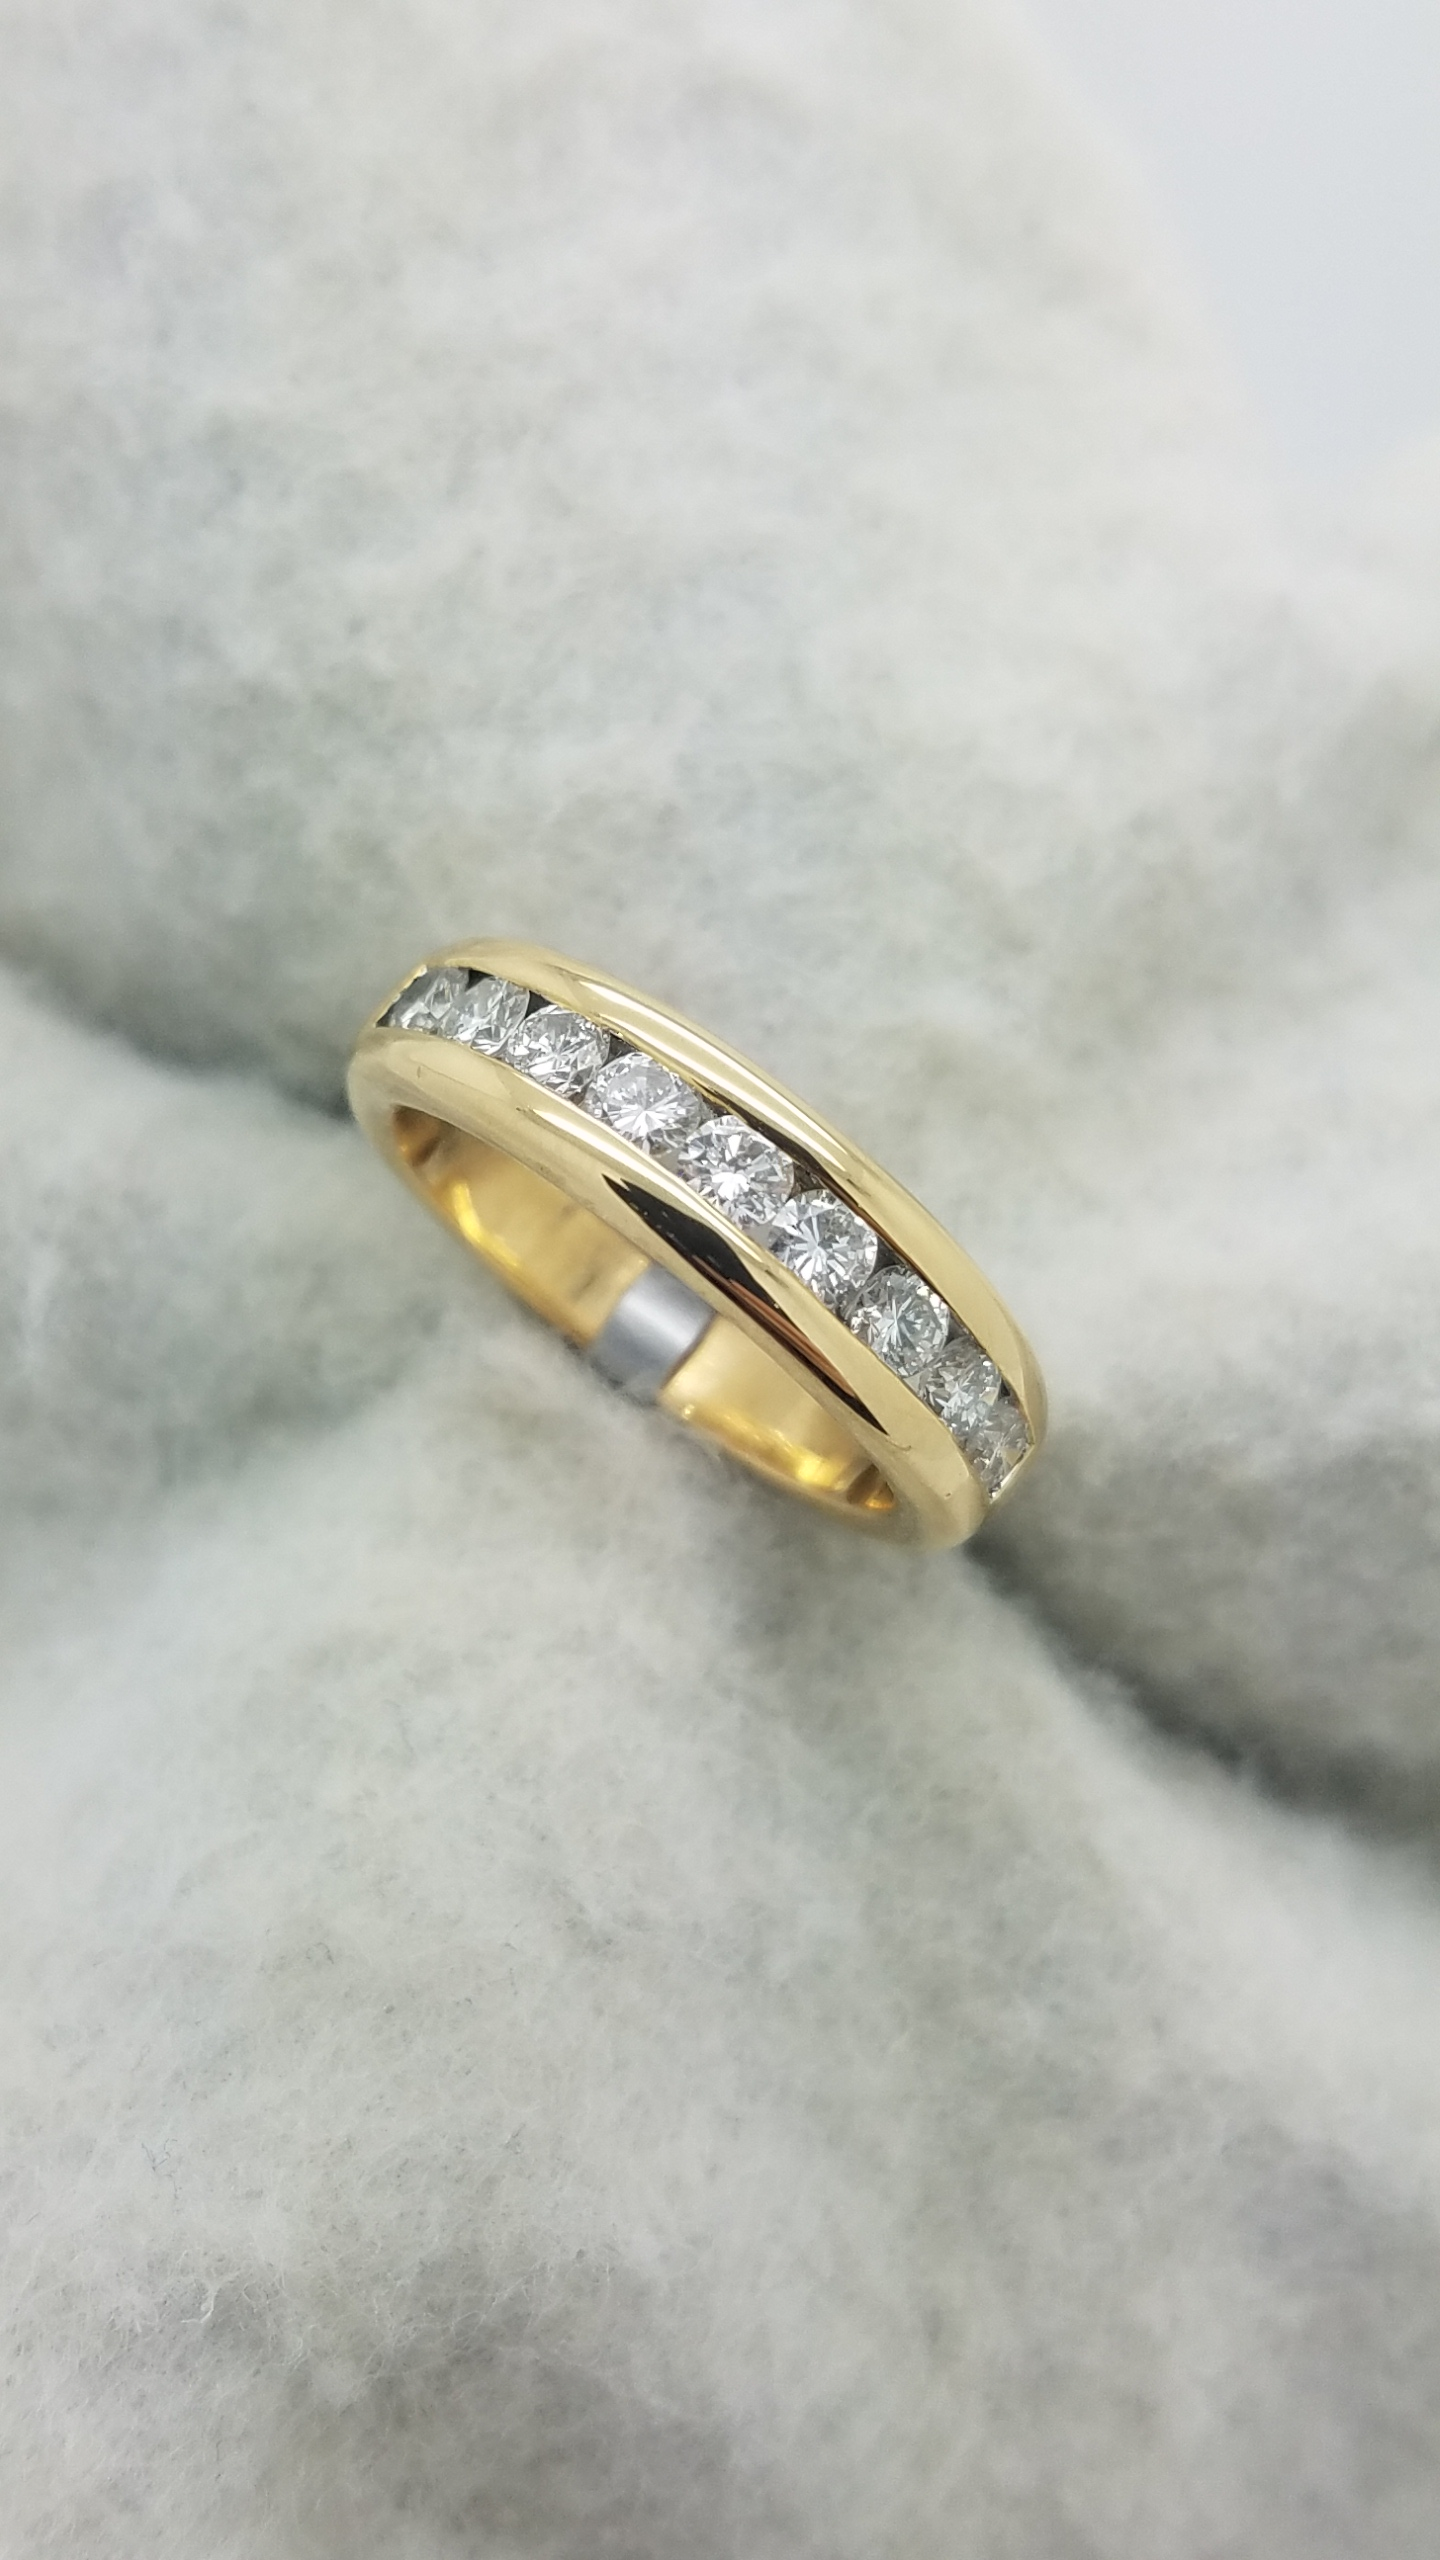 18K        Yellow Gold                0.75        ct        Round        Cut                Diamond        channel-set        Anniversary Band        Ring